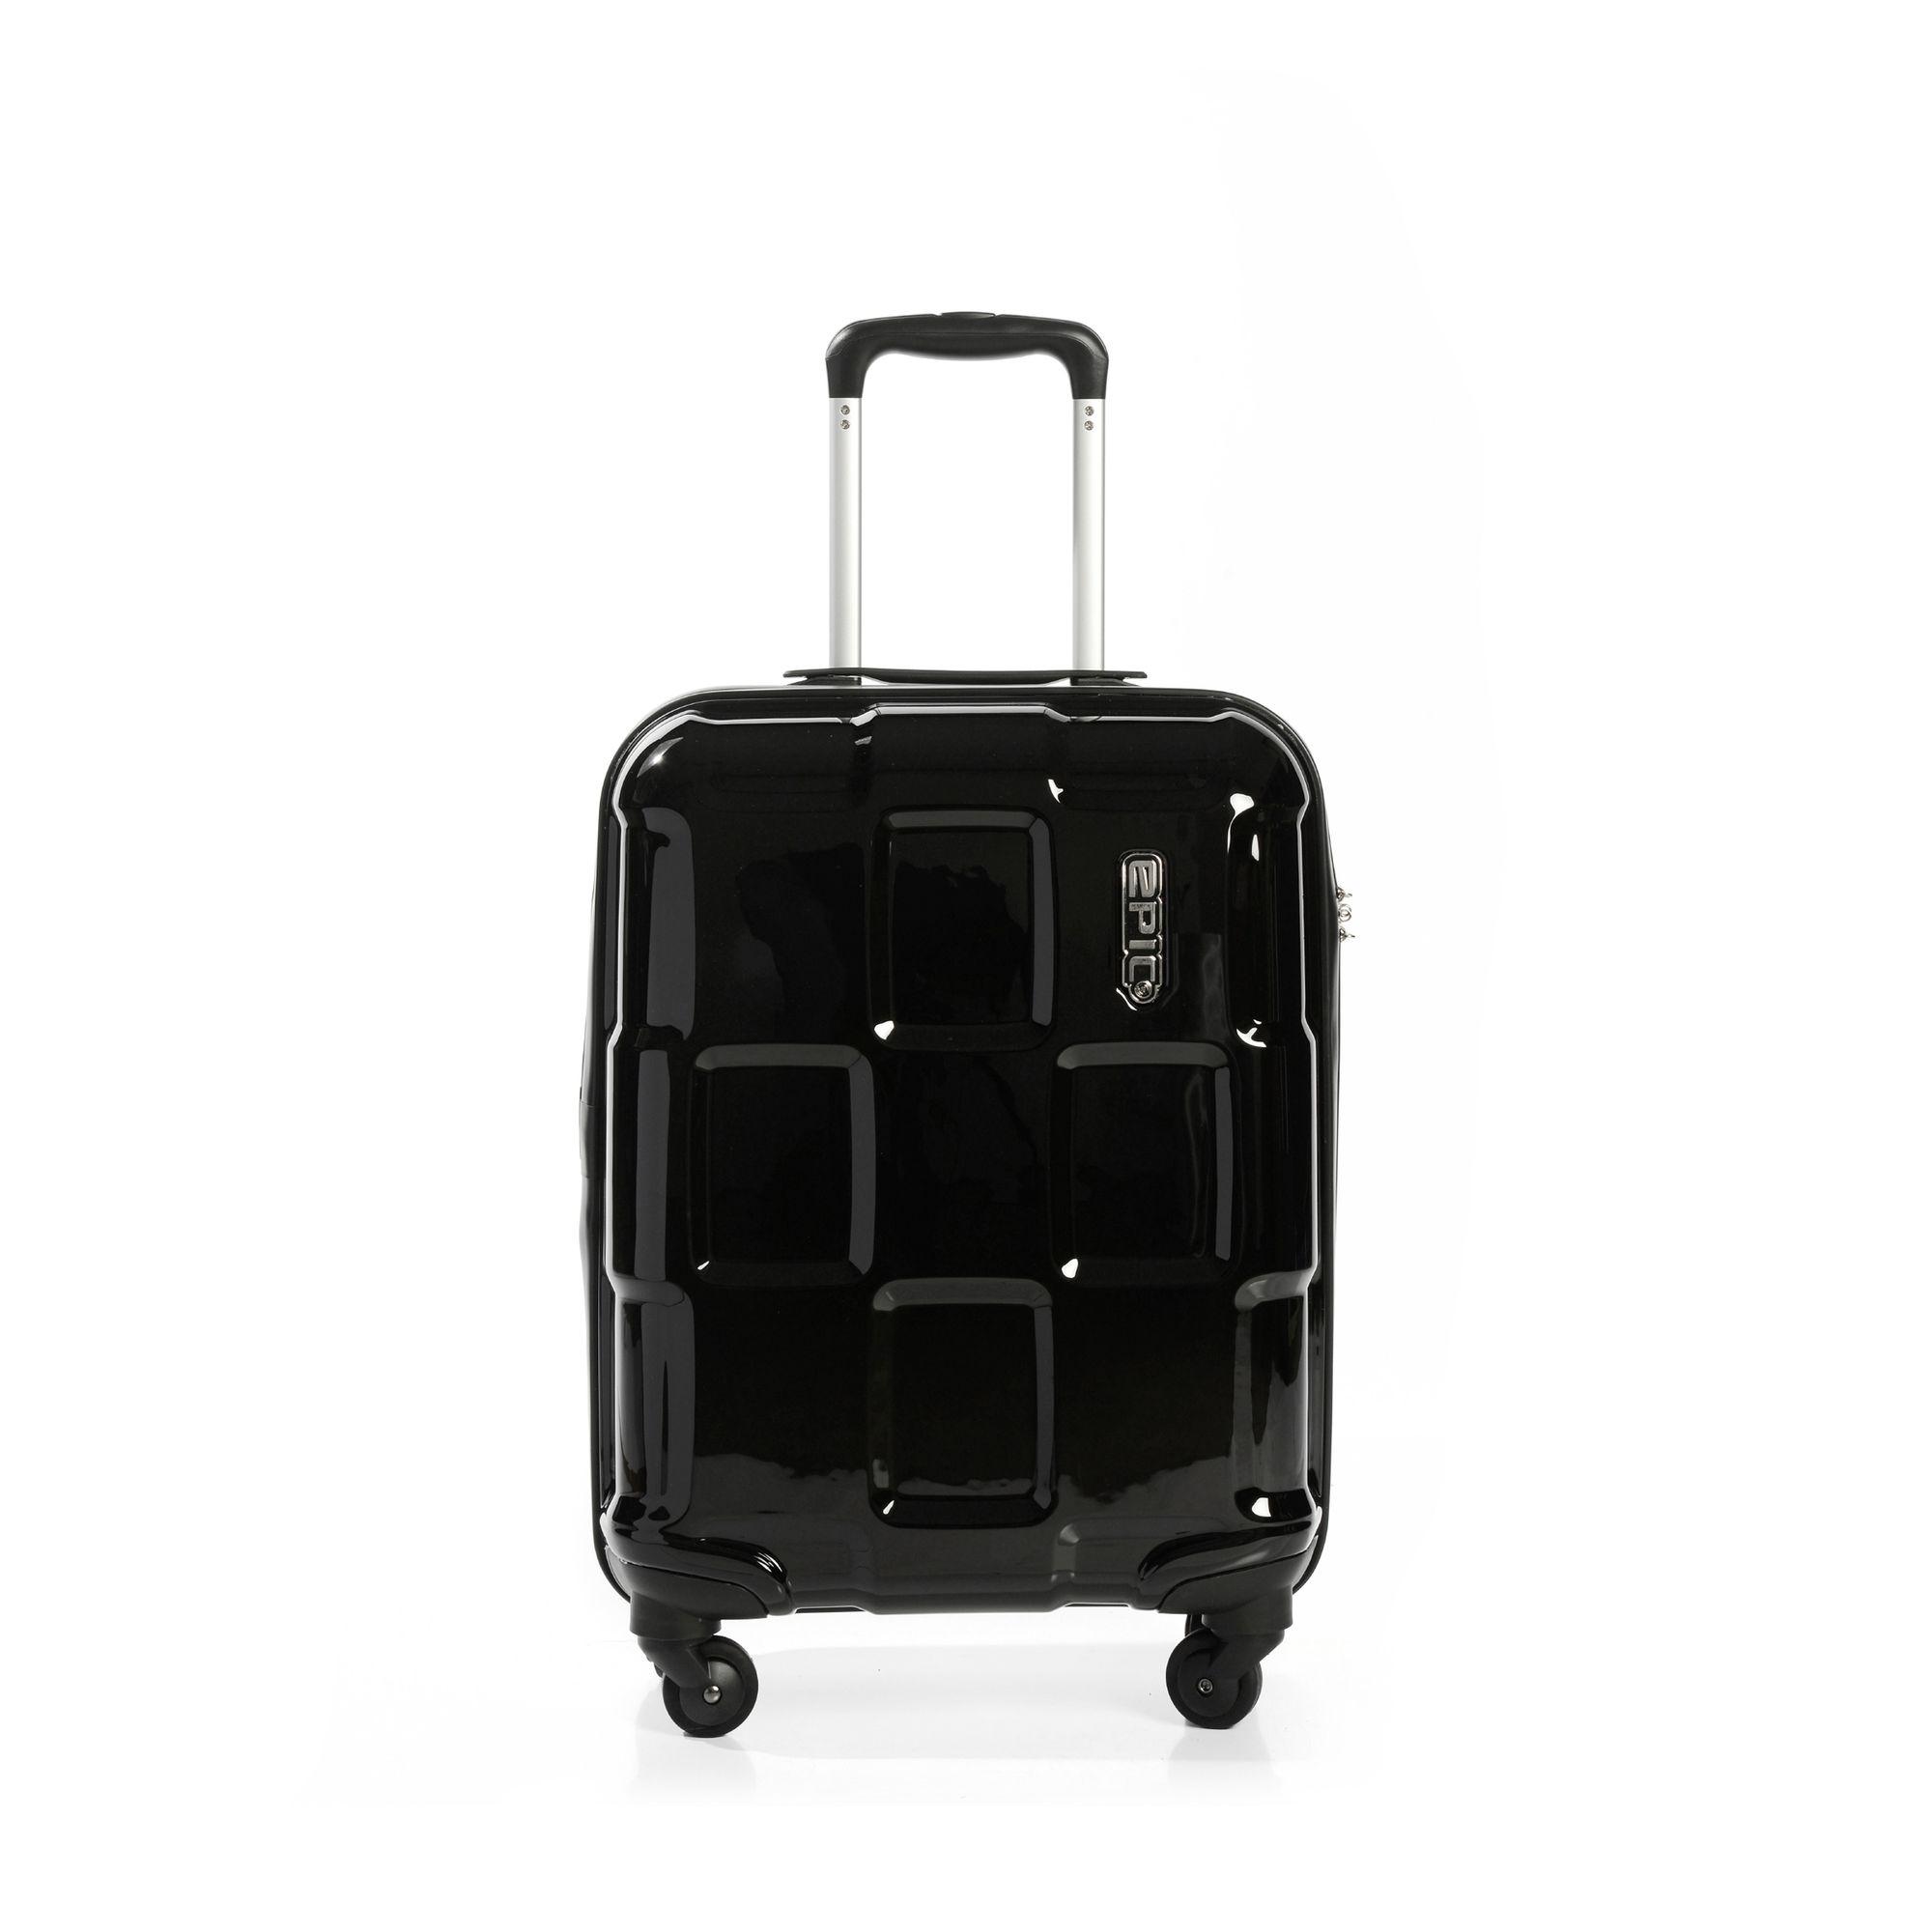 EPIC Crate EX Solids hård kabinväska, 4 hjul, 55 cm, Svart